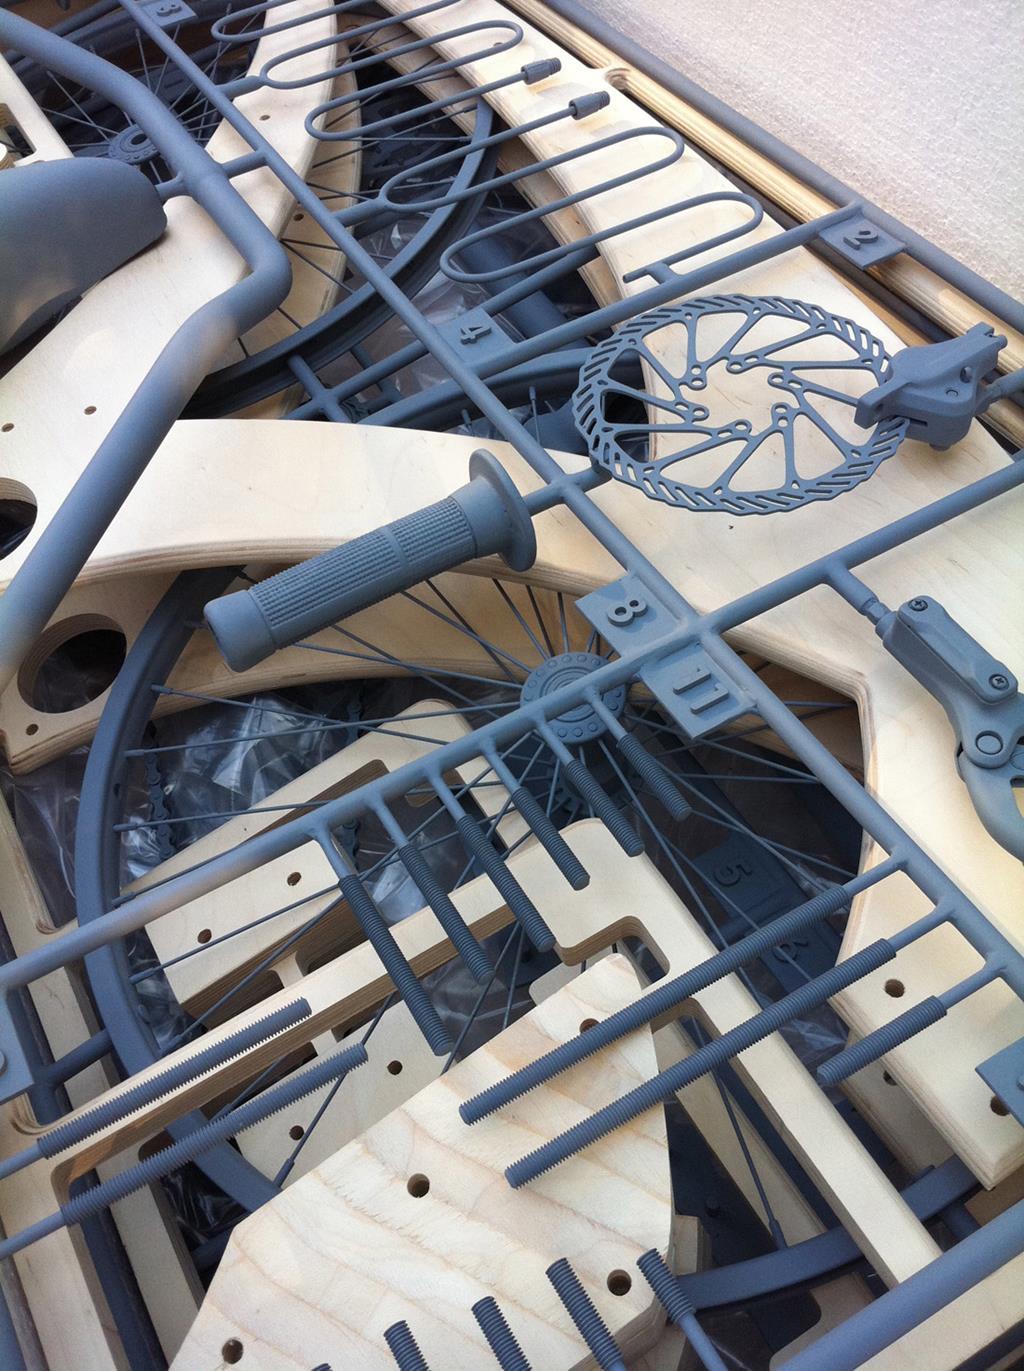 Sawyer Beachcruiser Plywood Bicycle by Jurgen Kuipers